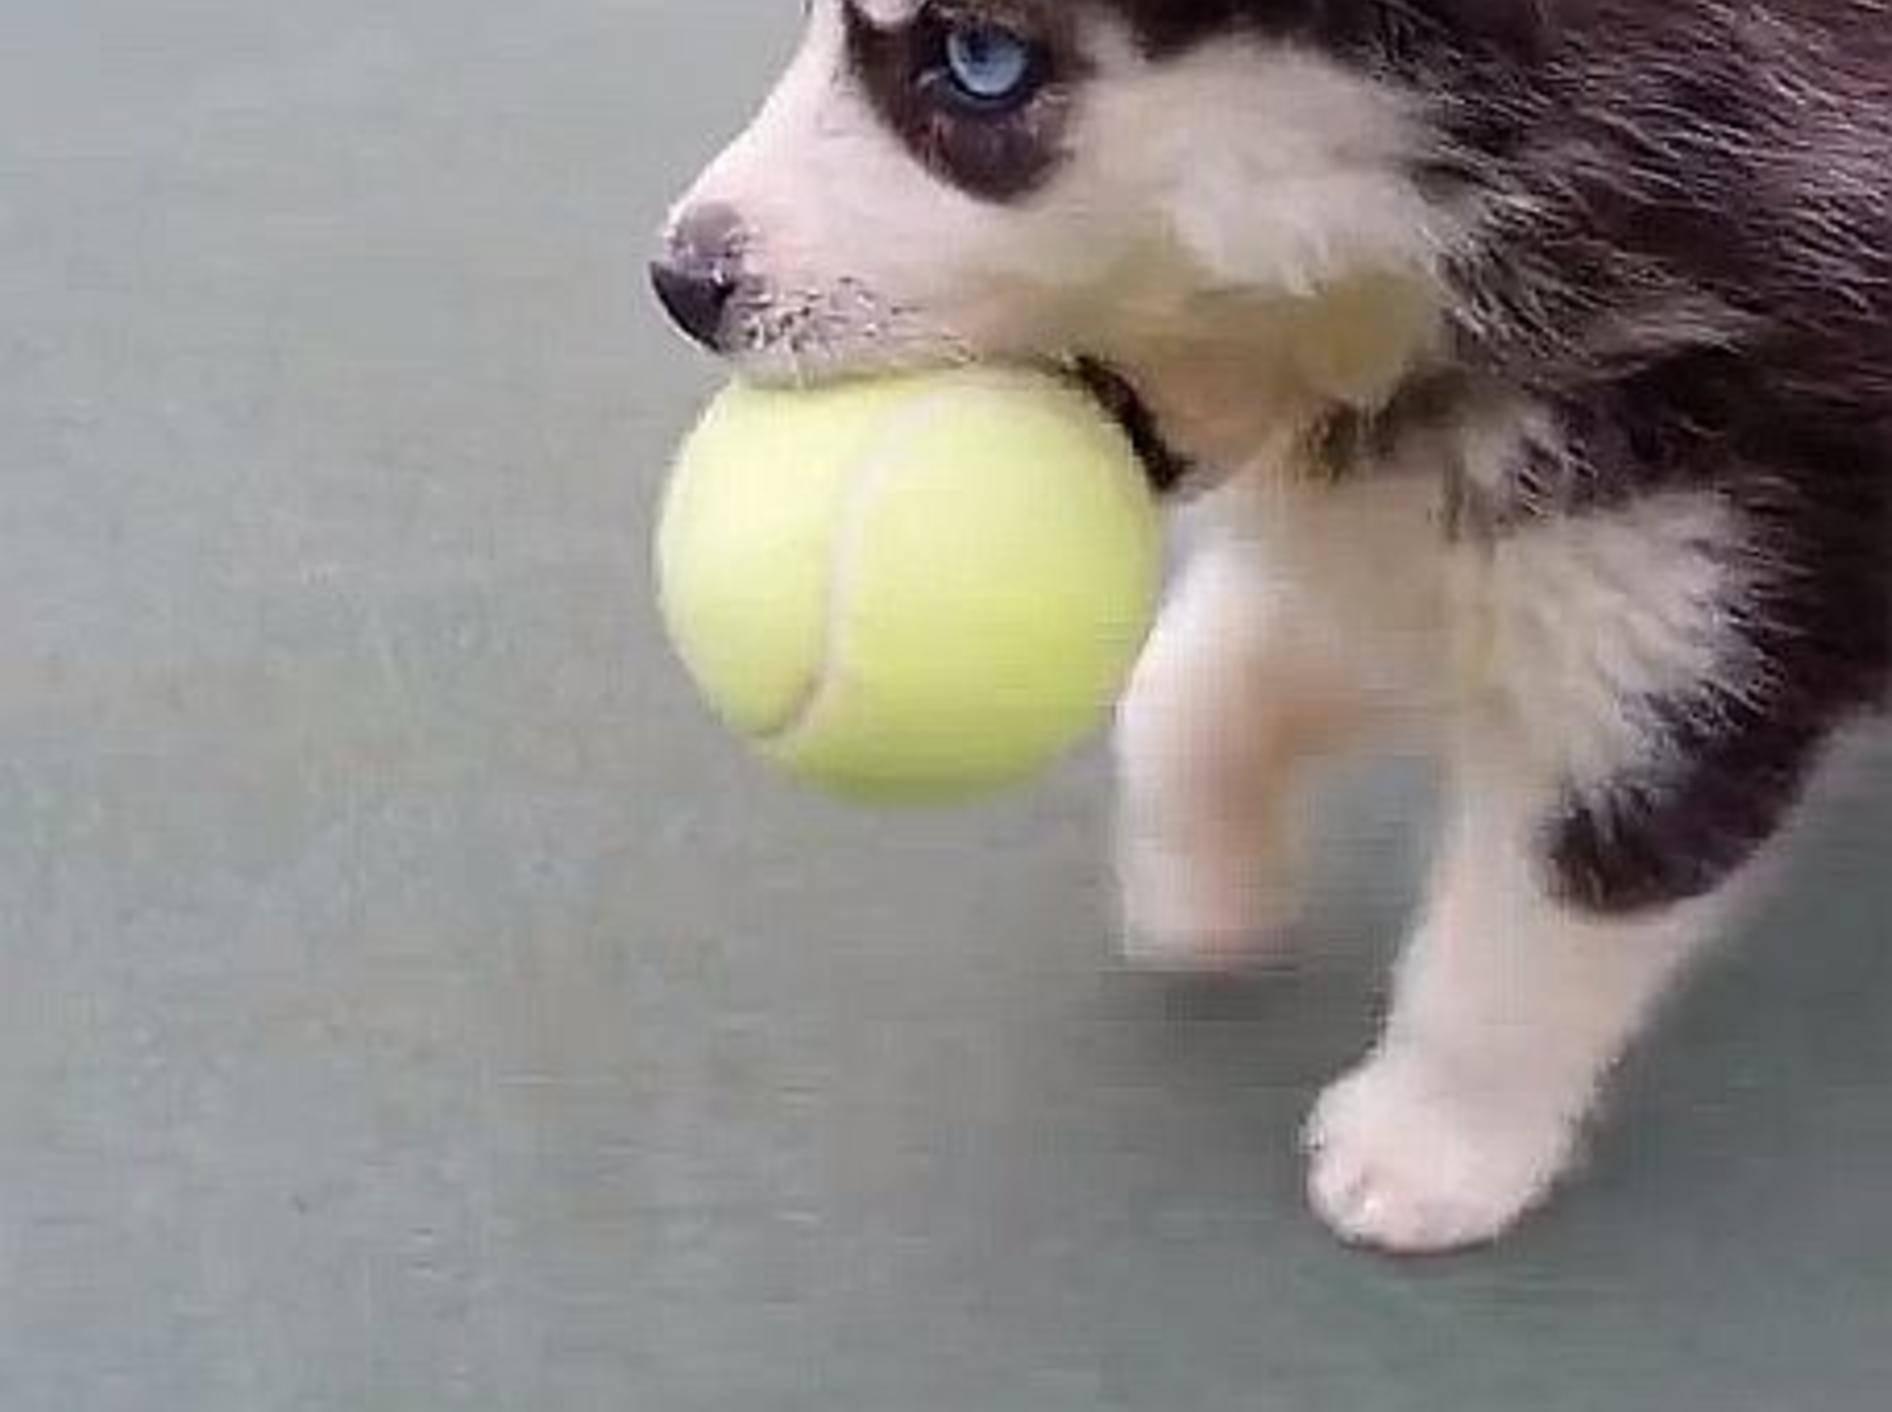 Husky-Welpe: Tennisball spielen macht Spaß! — Bild: Youtube / Michael Cooperman